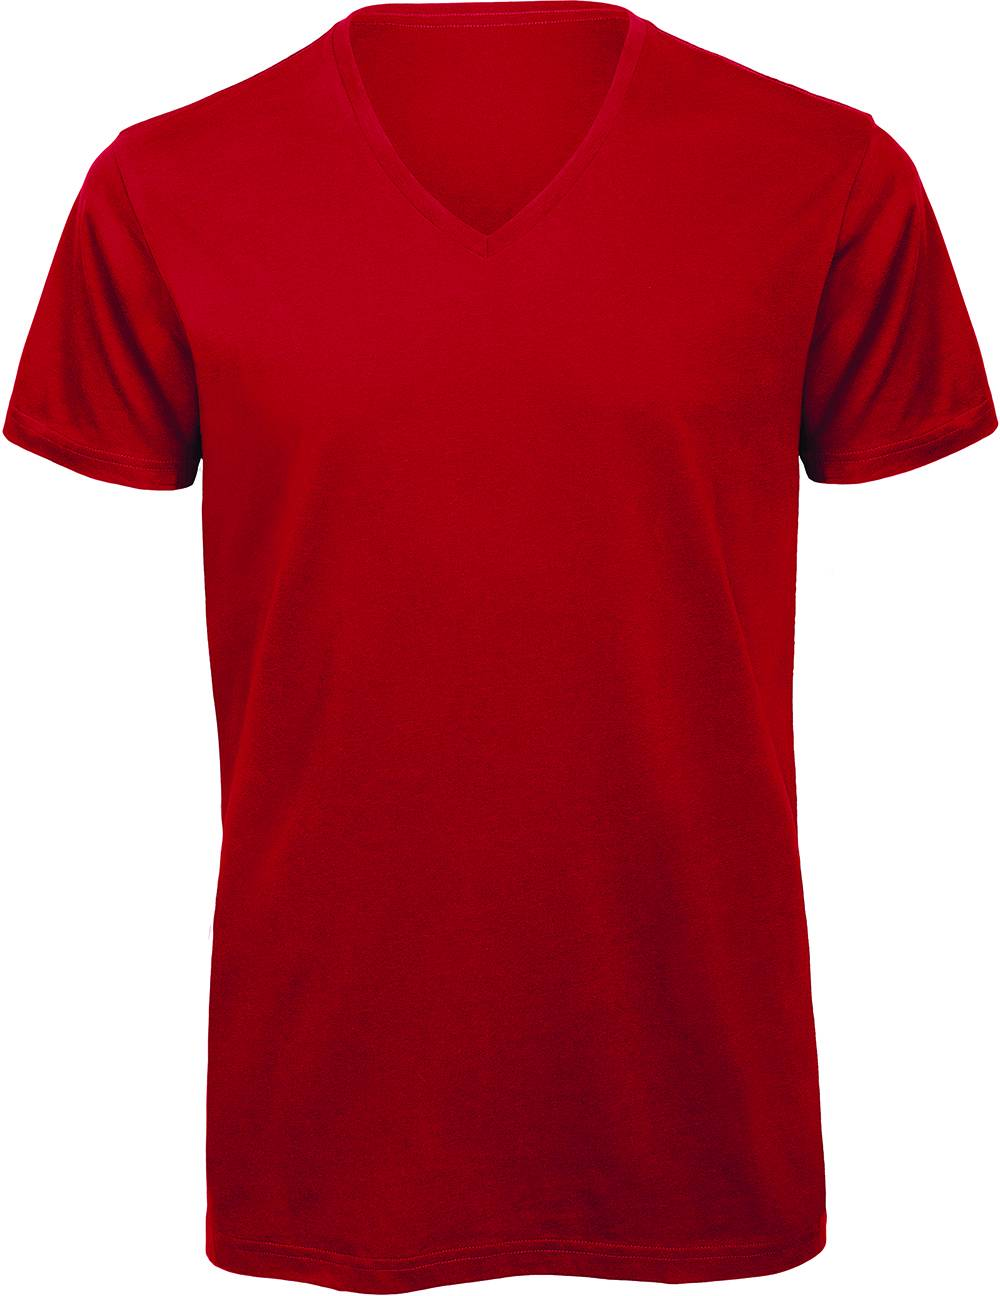 tee shirt bio homme femme disponible sur marseille. Black Bedroom Furniture Sets. Home Design Ideas